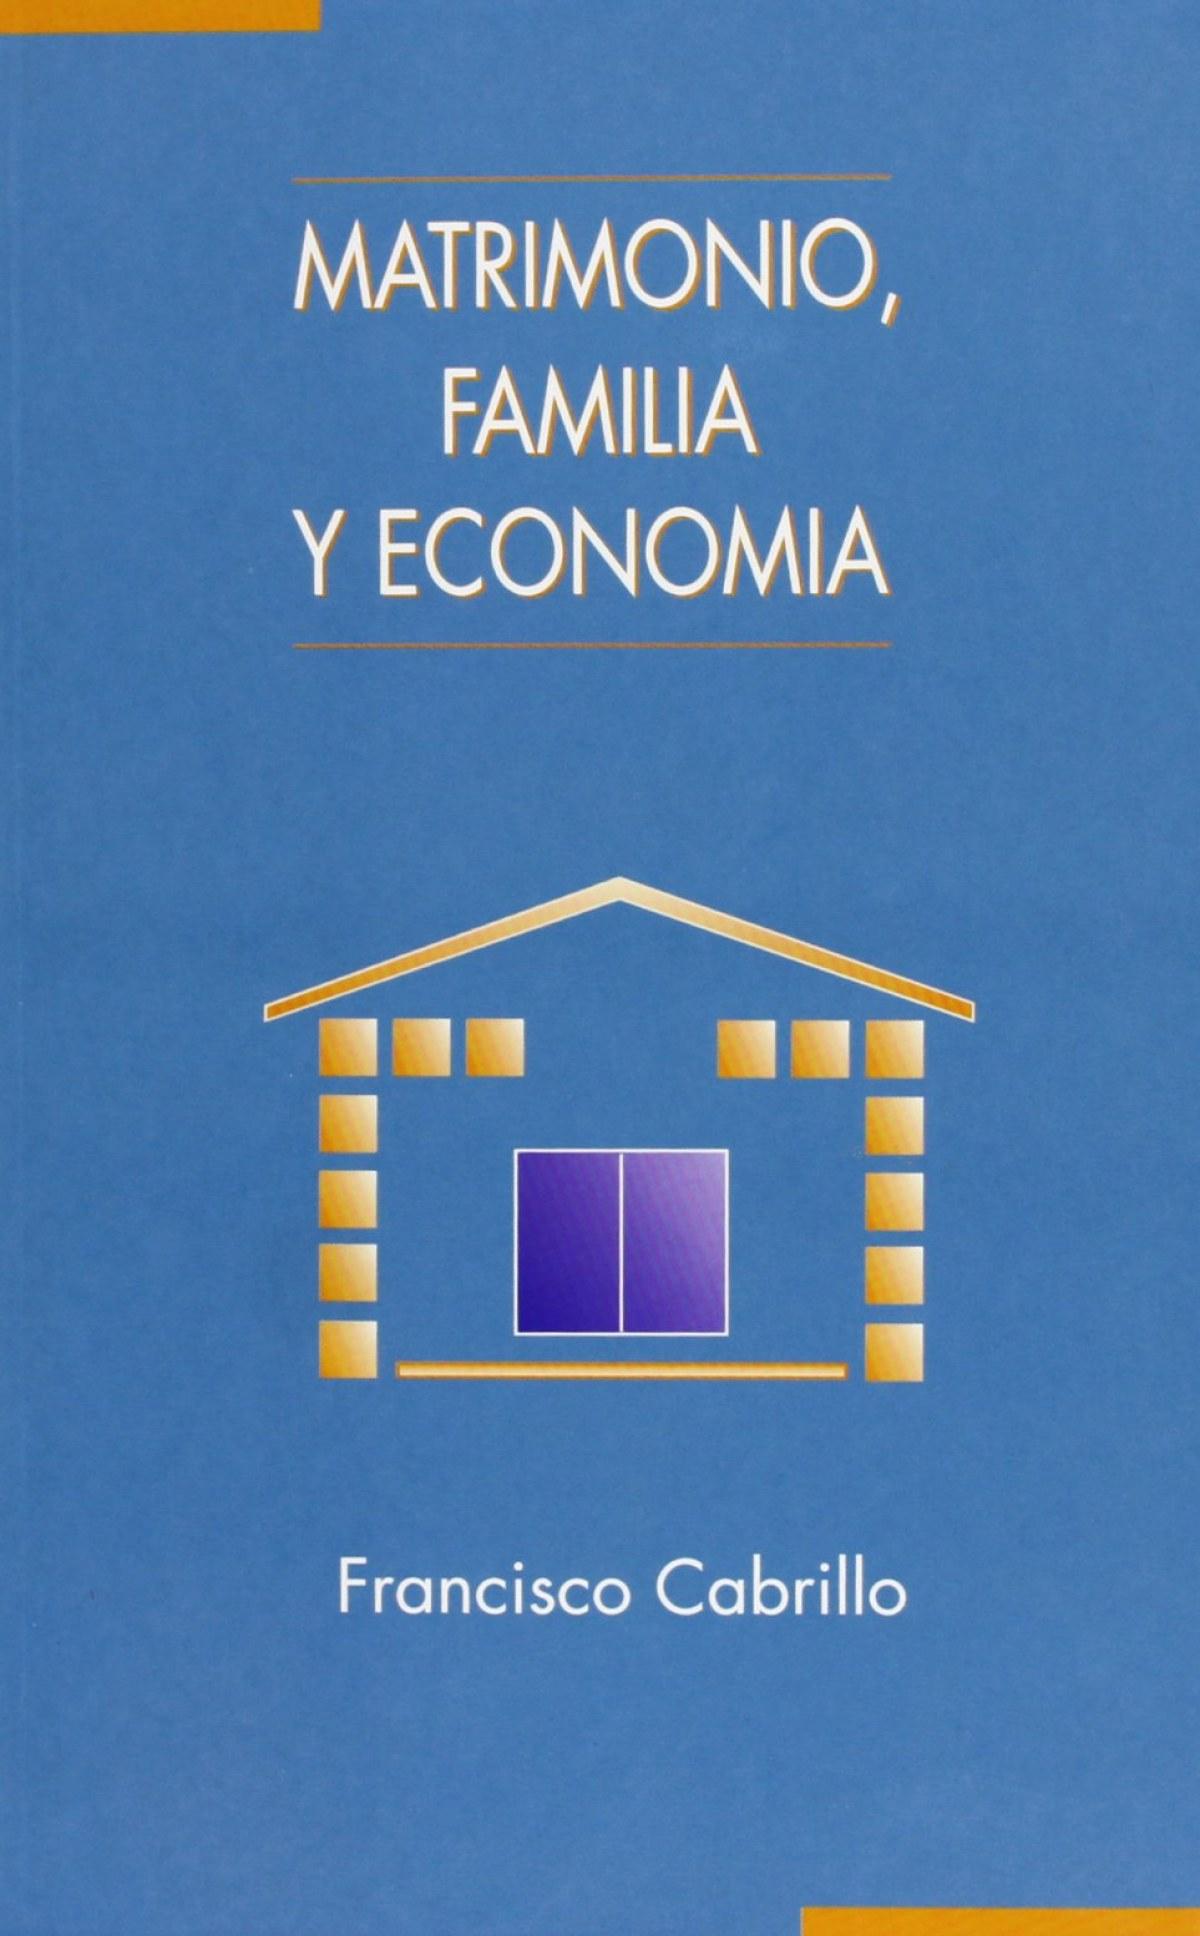 MATRIMONIO FAMILIA Y ECONOMIA